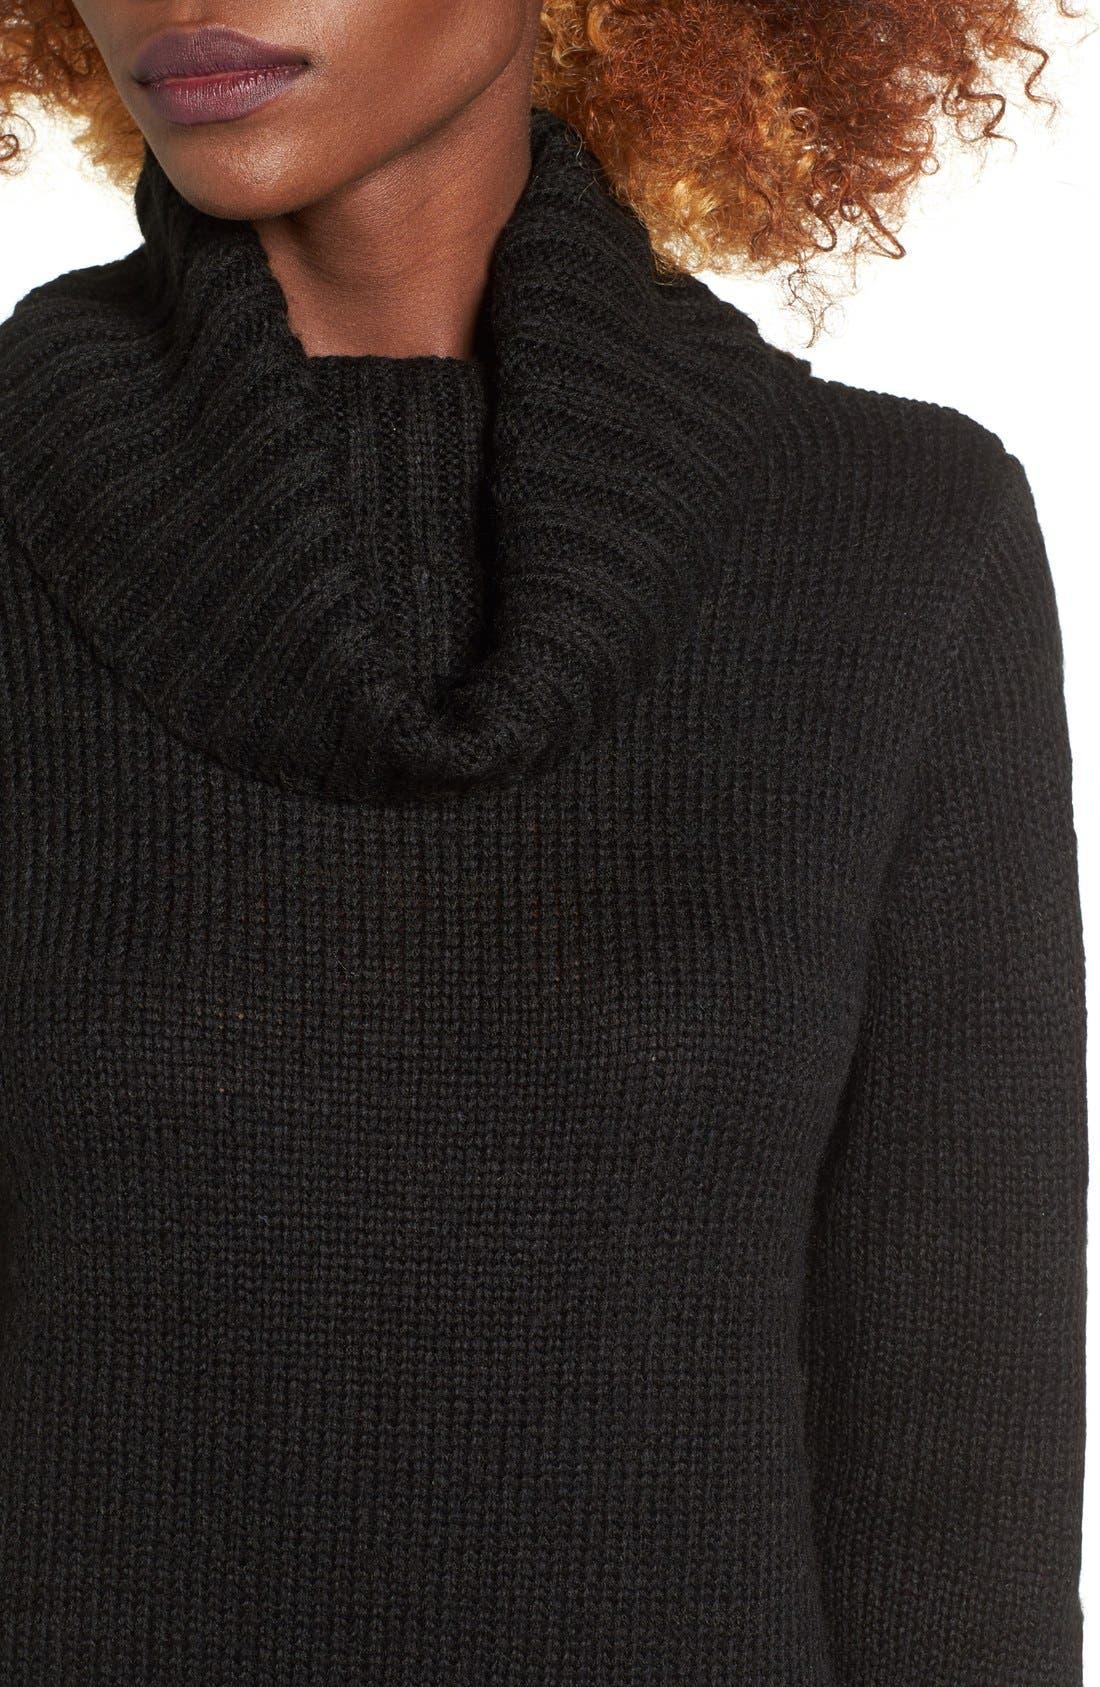 Turtleneck Sweater Dress,                             Alternate thumbnail 4, color,                             001